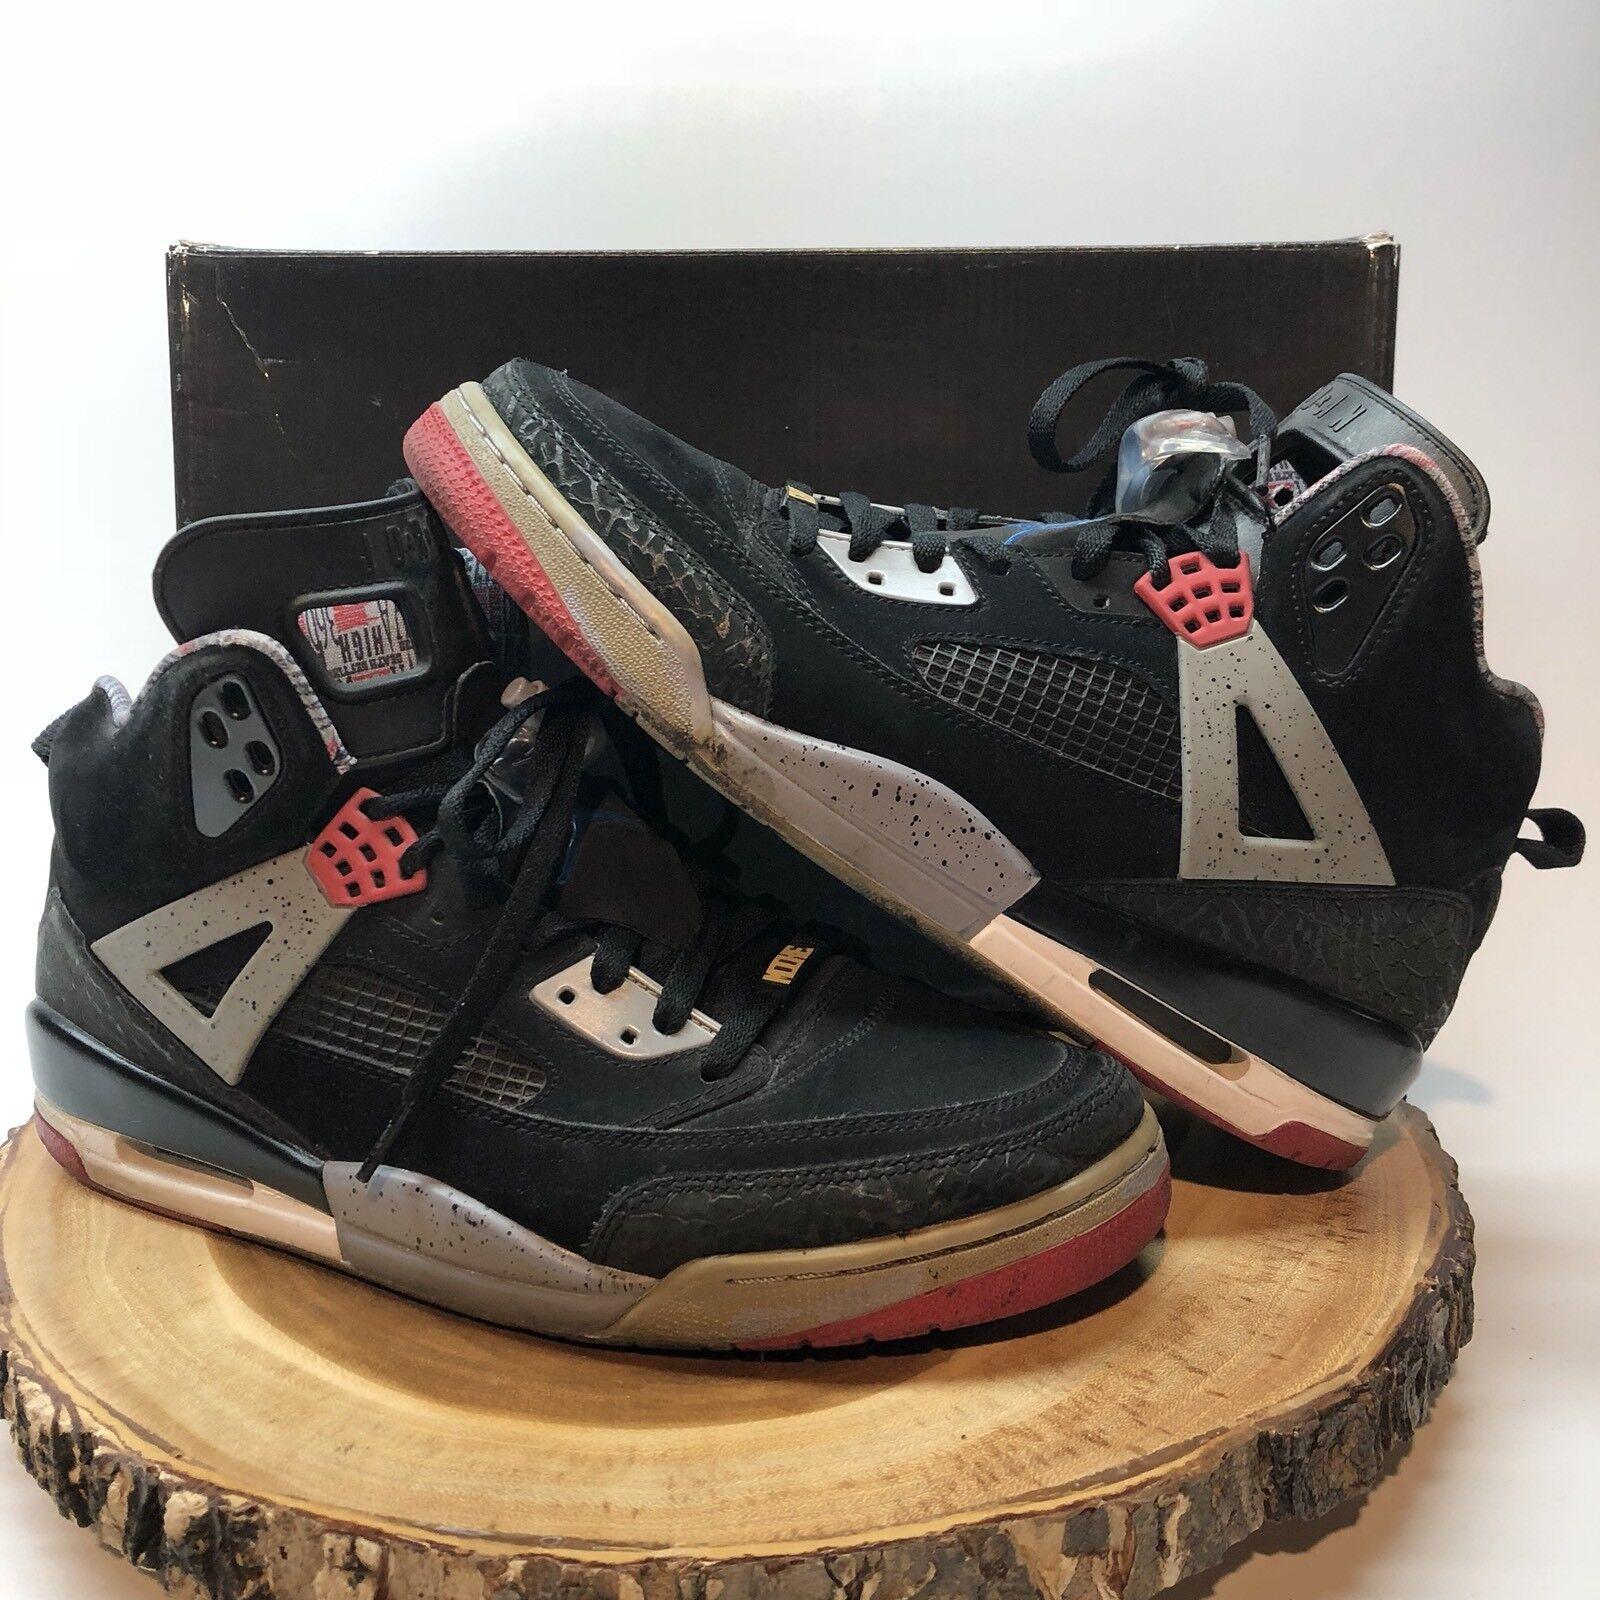 Nike air jordan spizike cemento rosso allevati blu 315371-062 sz 12 allevati rosso iv militare 8728dc